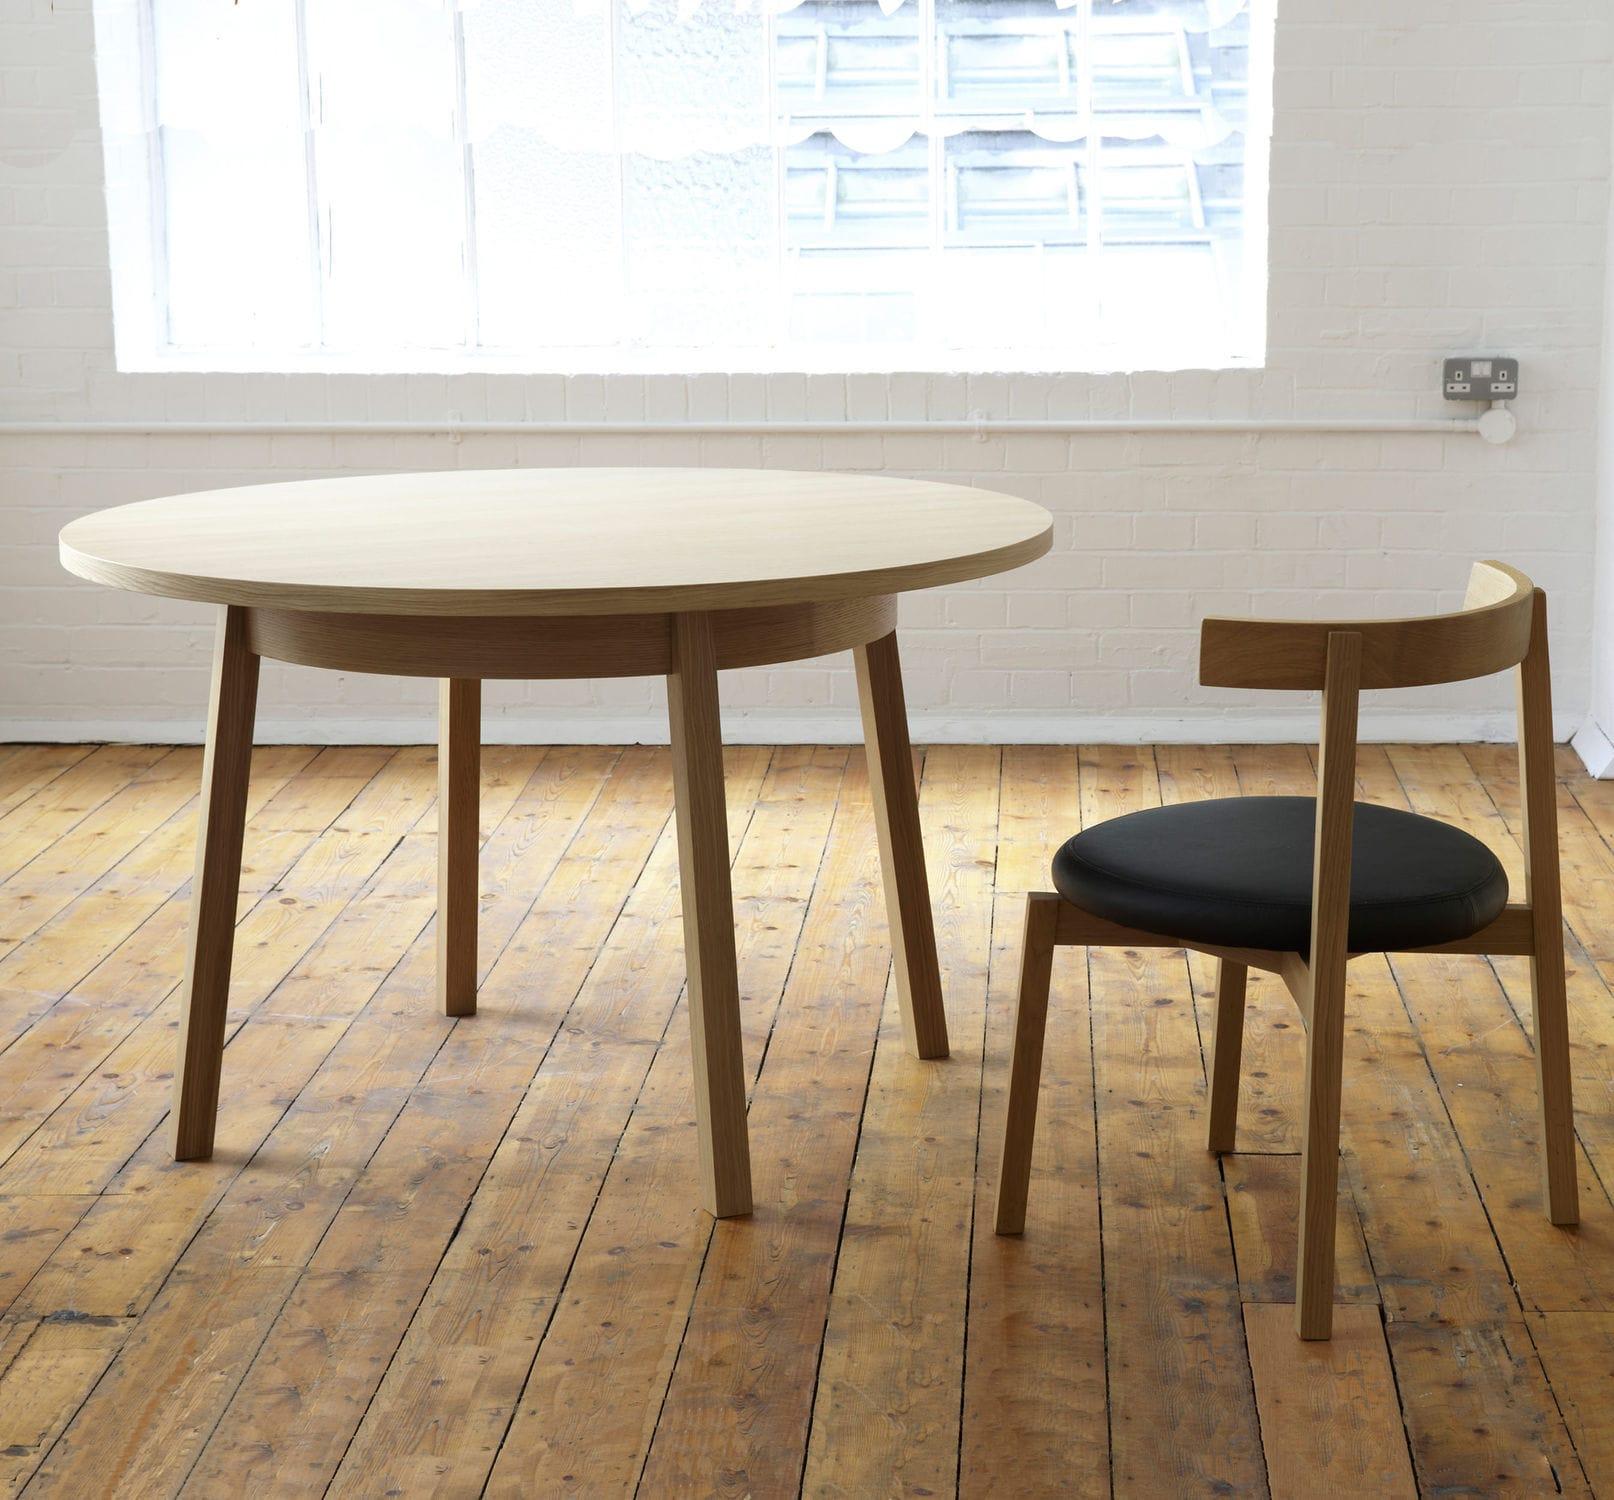 Mesa de edor moderna de madera redonda para restaurante